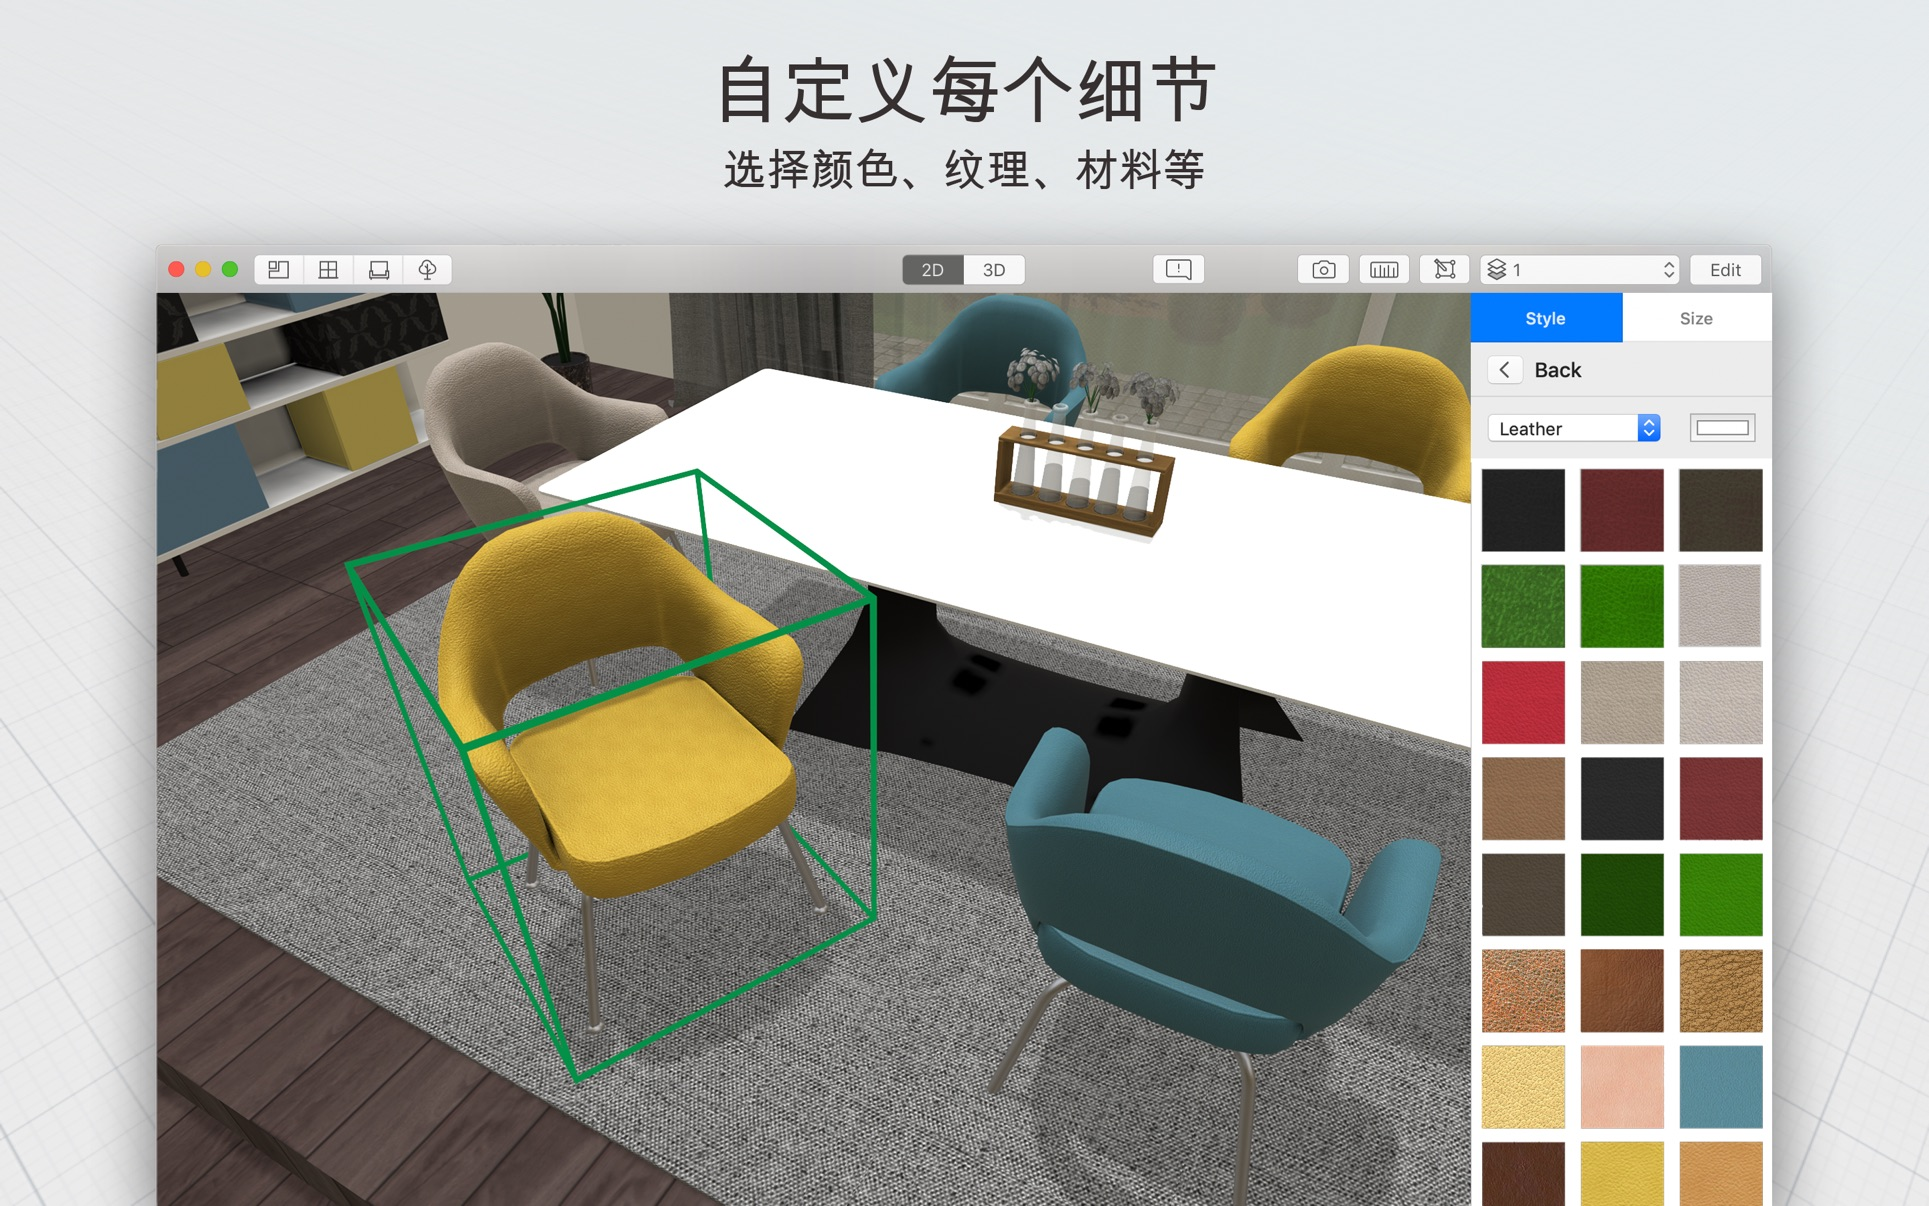 Planner 5D 4.4.6 Mac 破解版 优秀的3D家具设计软件